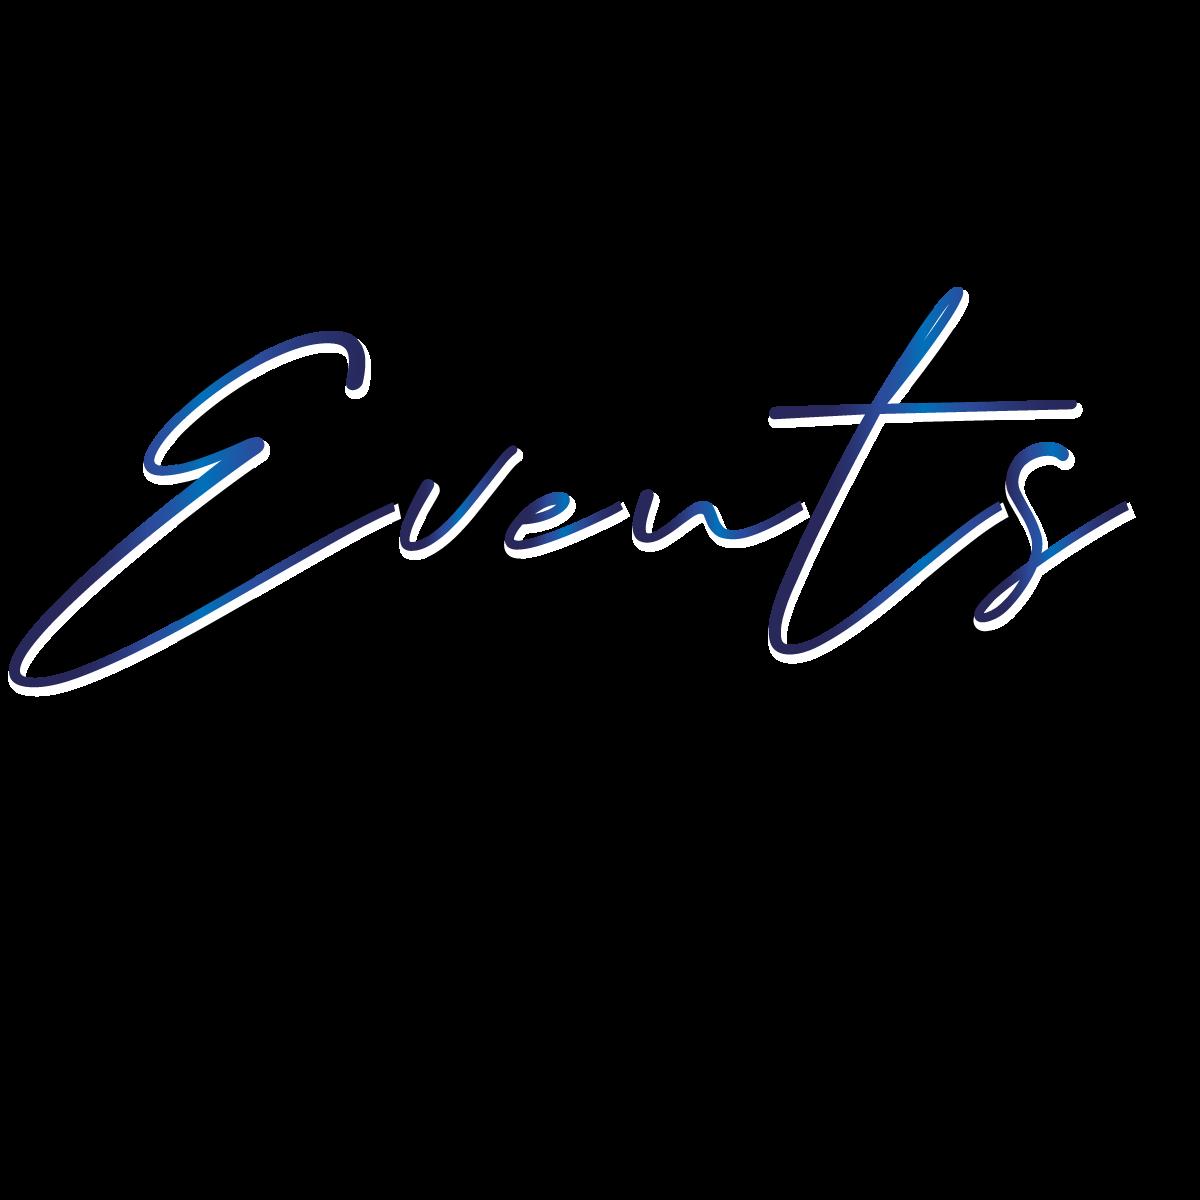 Premium Quality Events